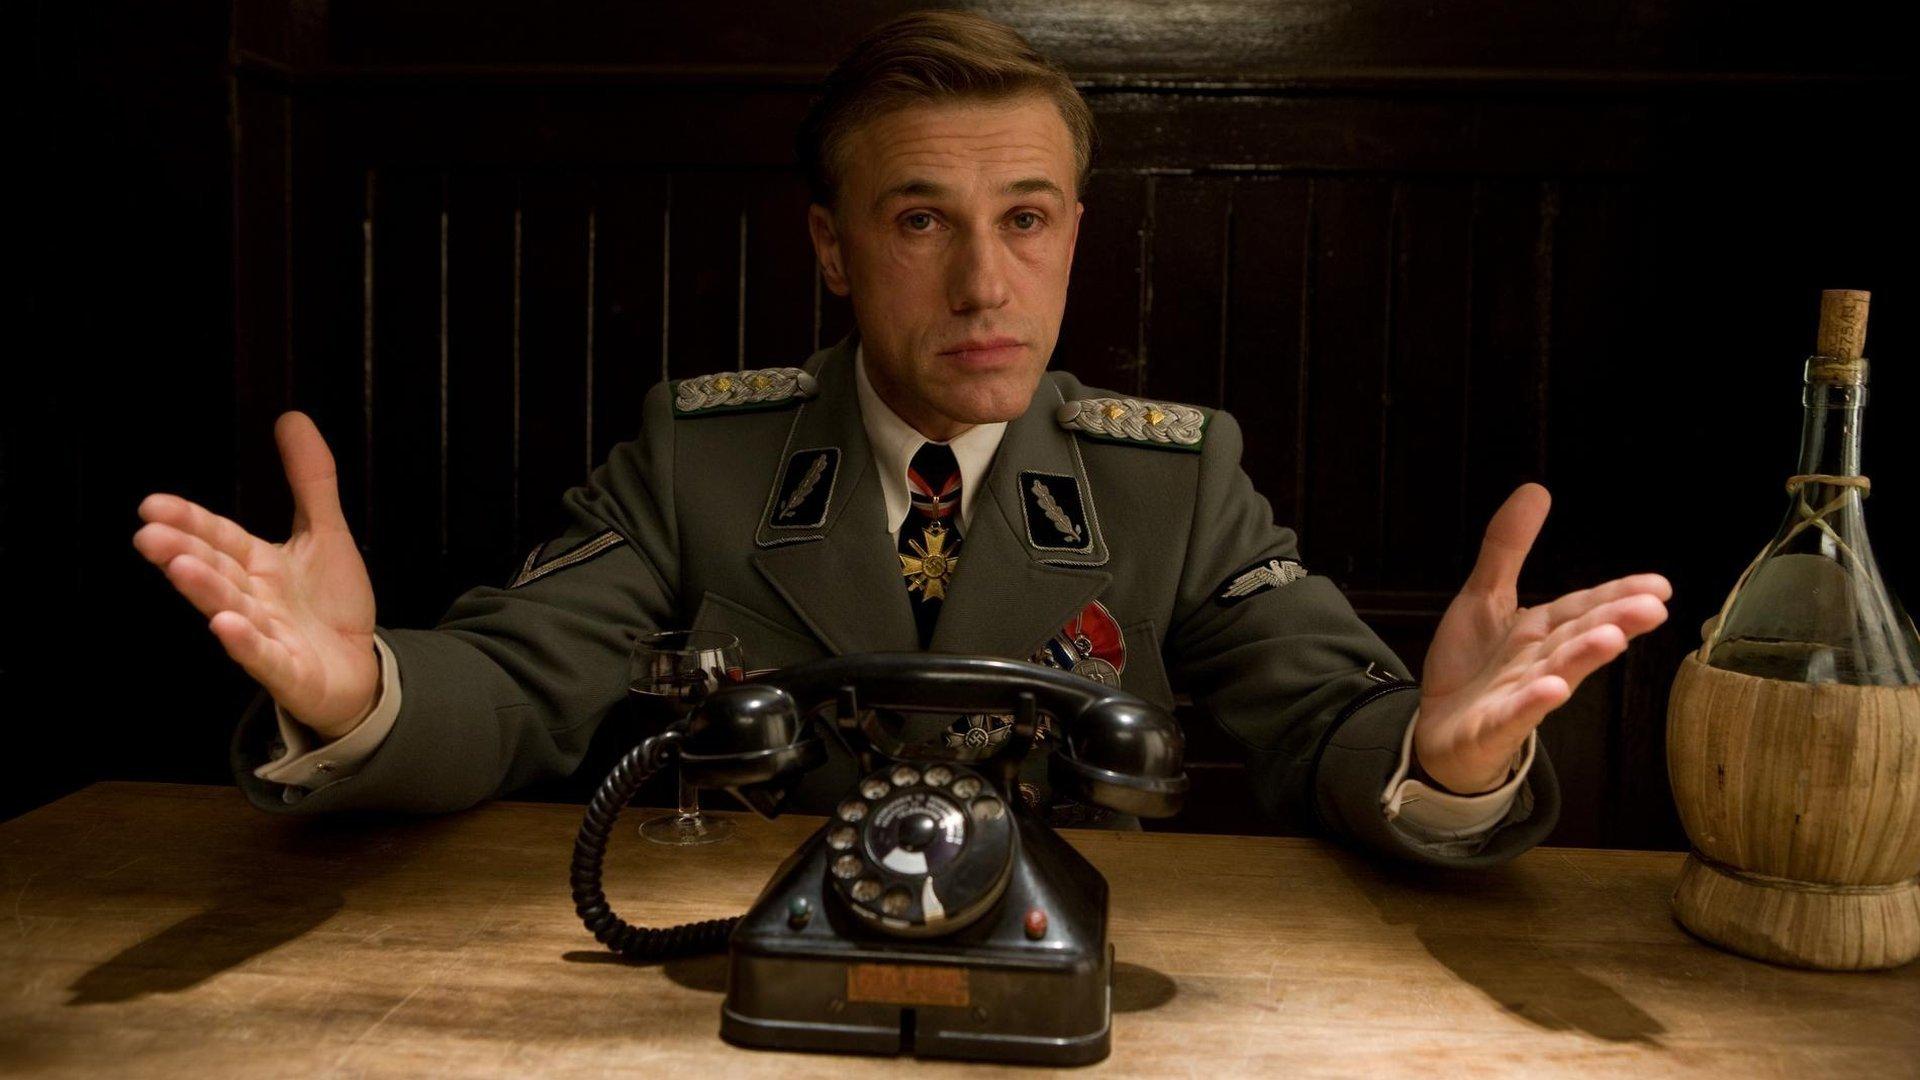 Christoph Waltz in Inglourious Basterds (2009) | Lantern Entertainment